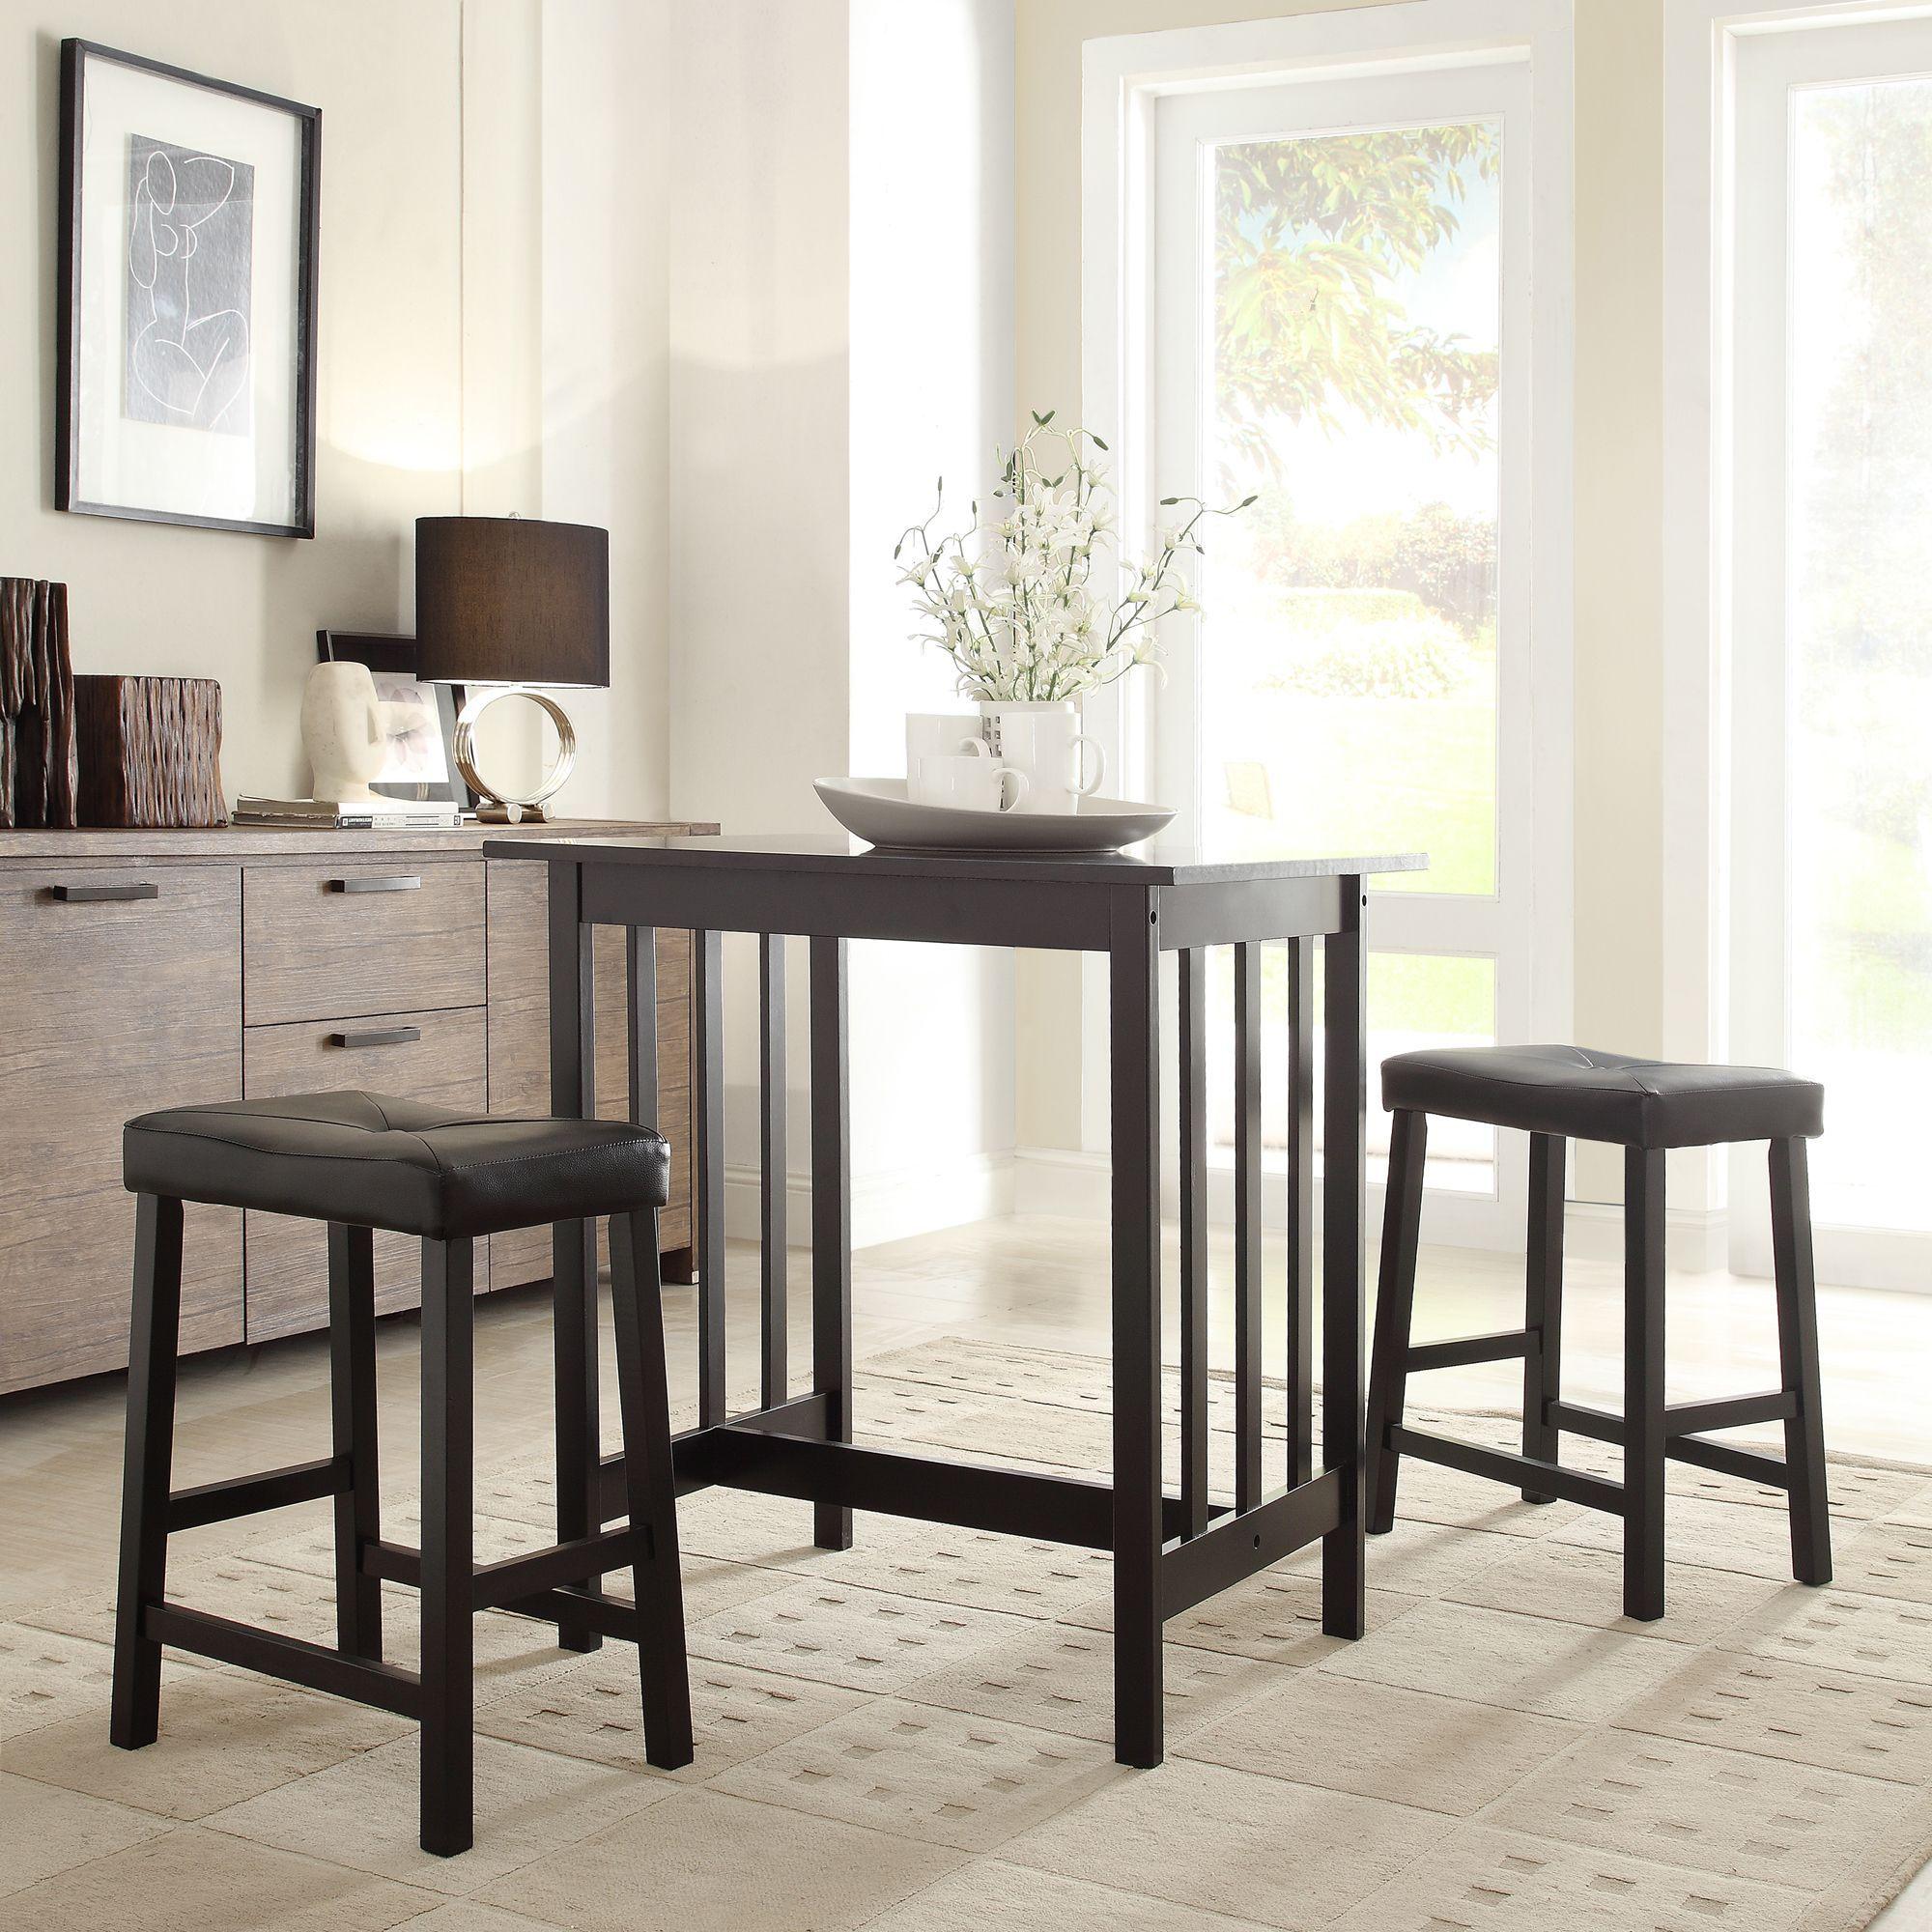 Nova 3-piece Kitchen Counter Height Dinette Set by iNSPIRE Q Classic by  iNSPIRE Q. Counter Height Bar StoolsCounter ...